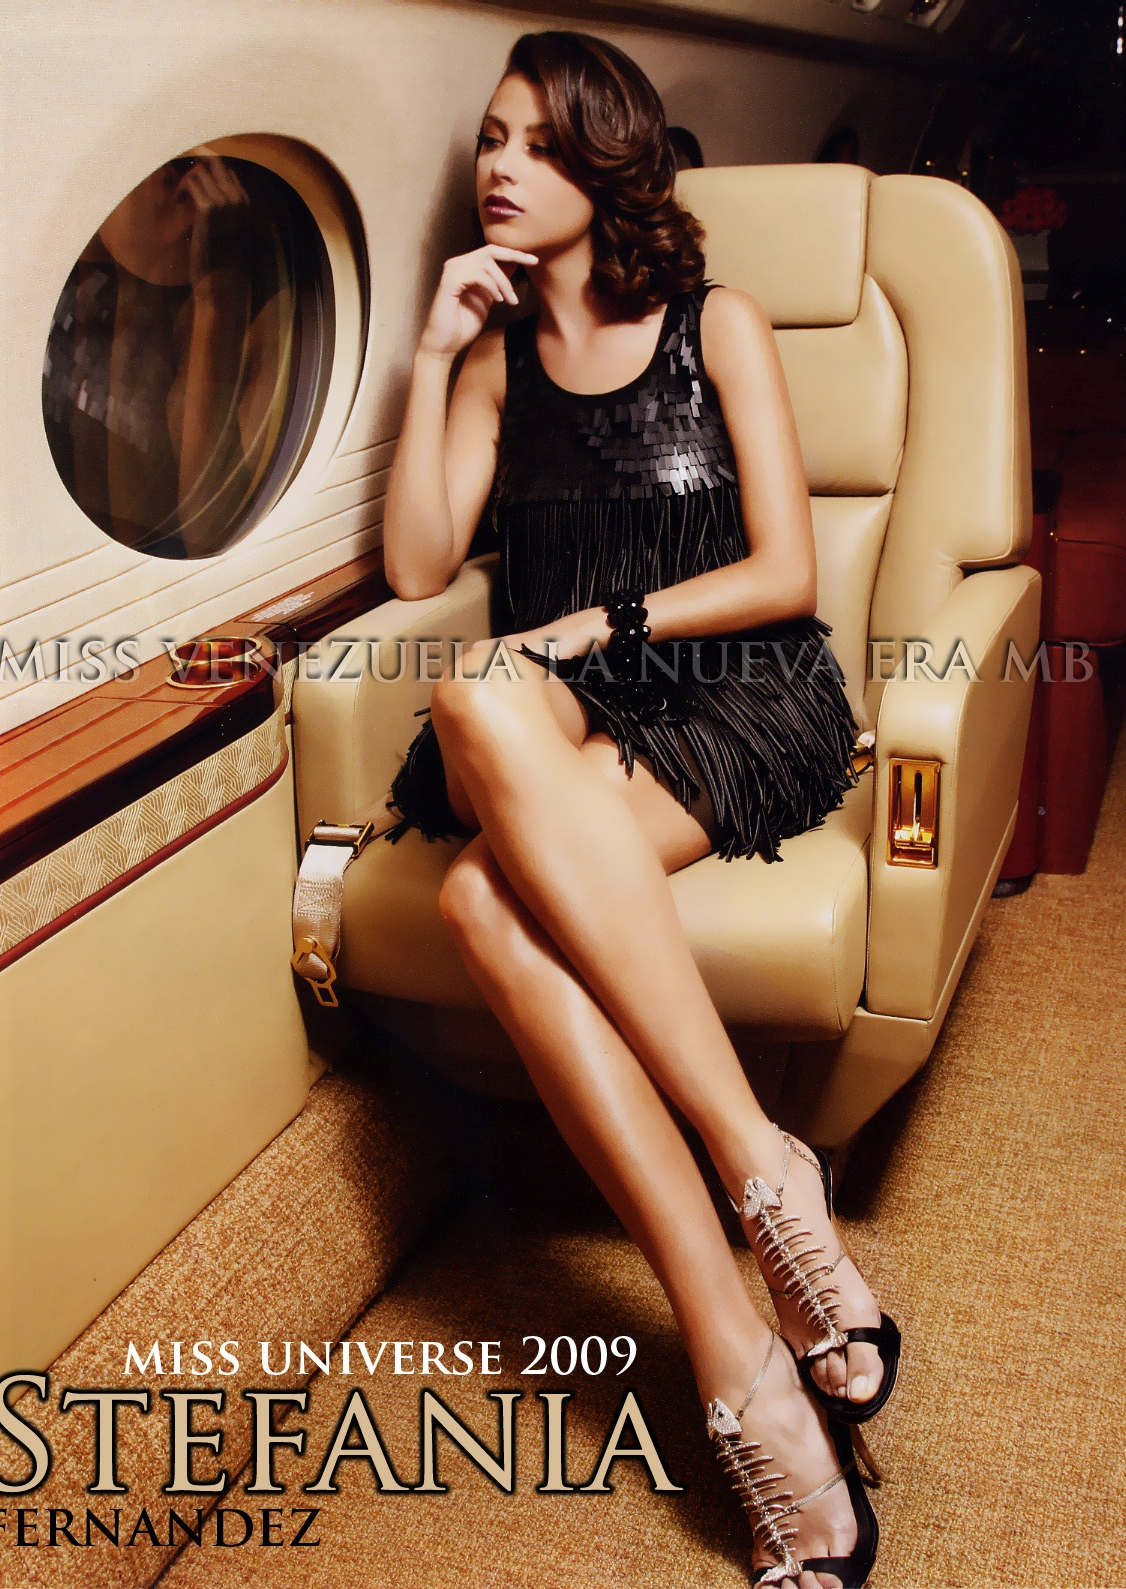 Stefania Fernandez Profile And Biography With Latest ... |Stefania Fernandez 2014